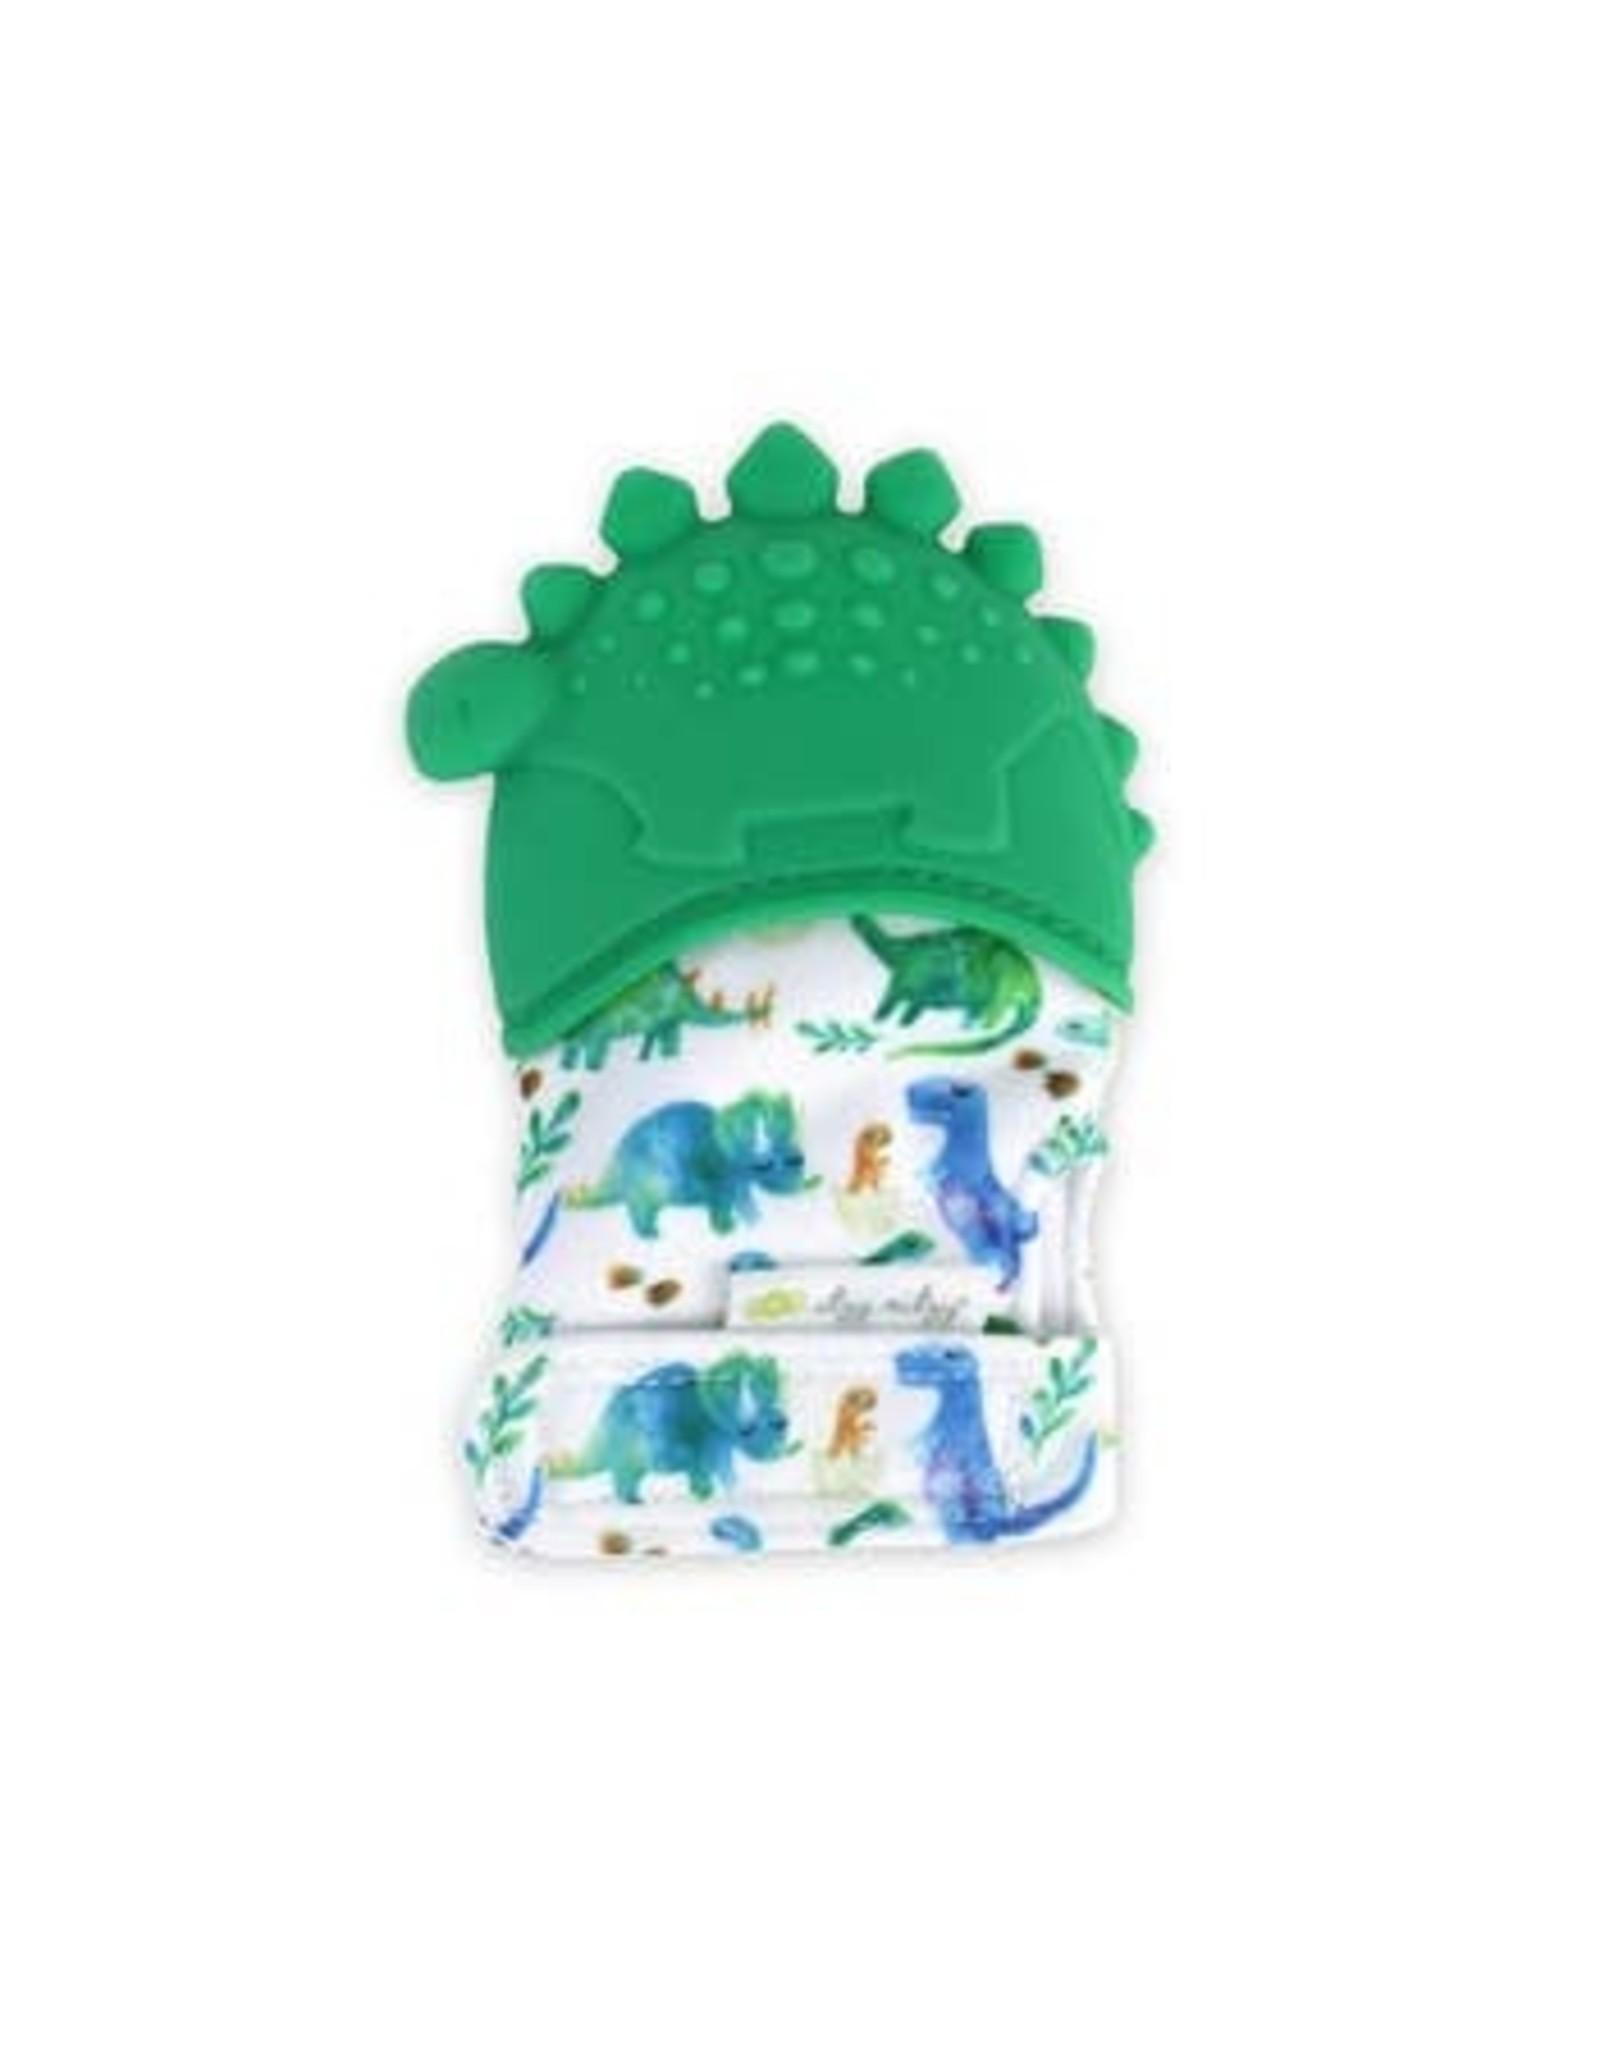 Itzy Ritzy Itzy Ritzy - Itzy Mitzies: Dinosaur Teething Mitt